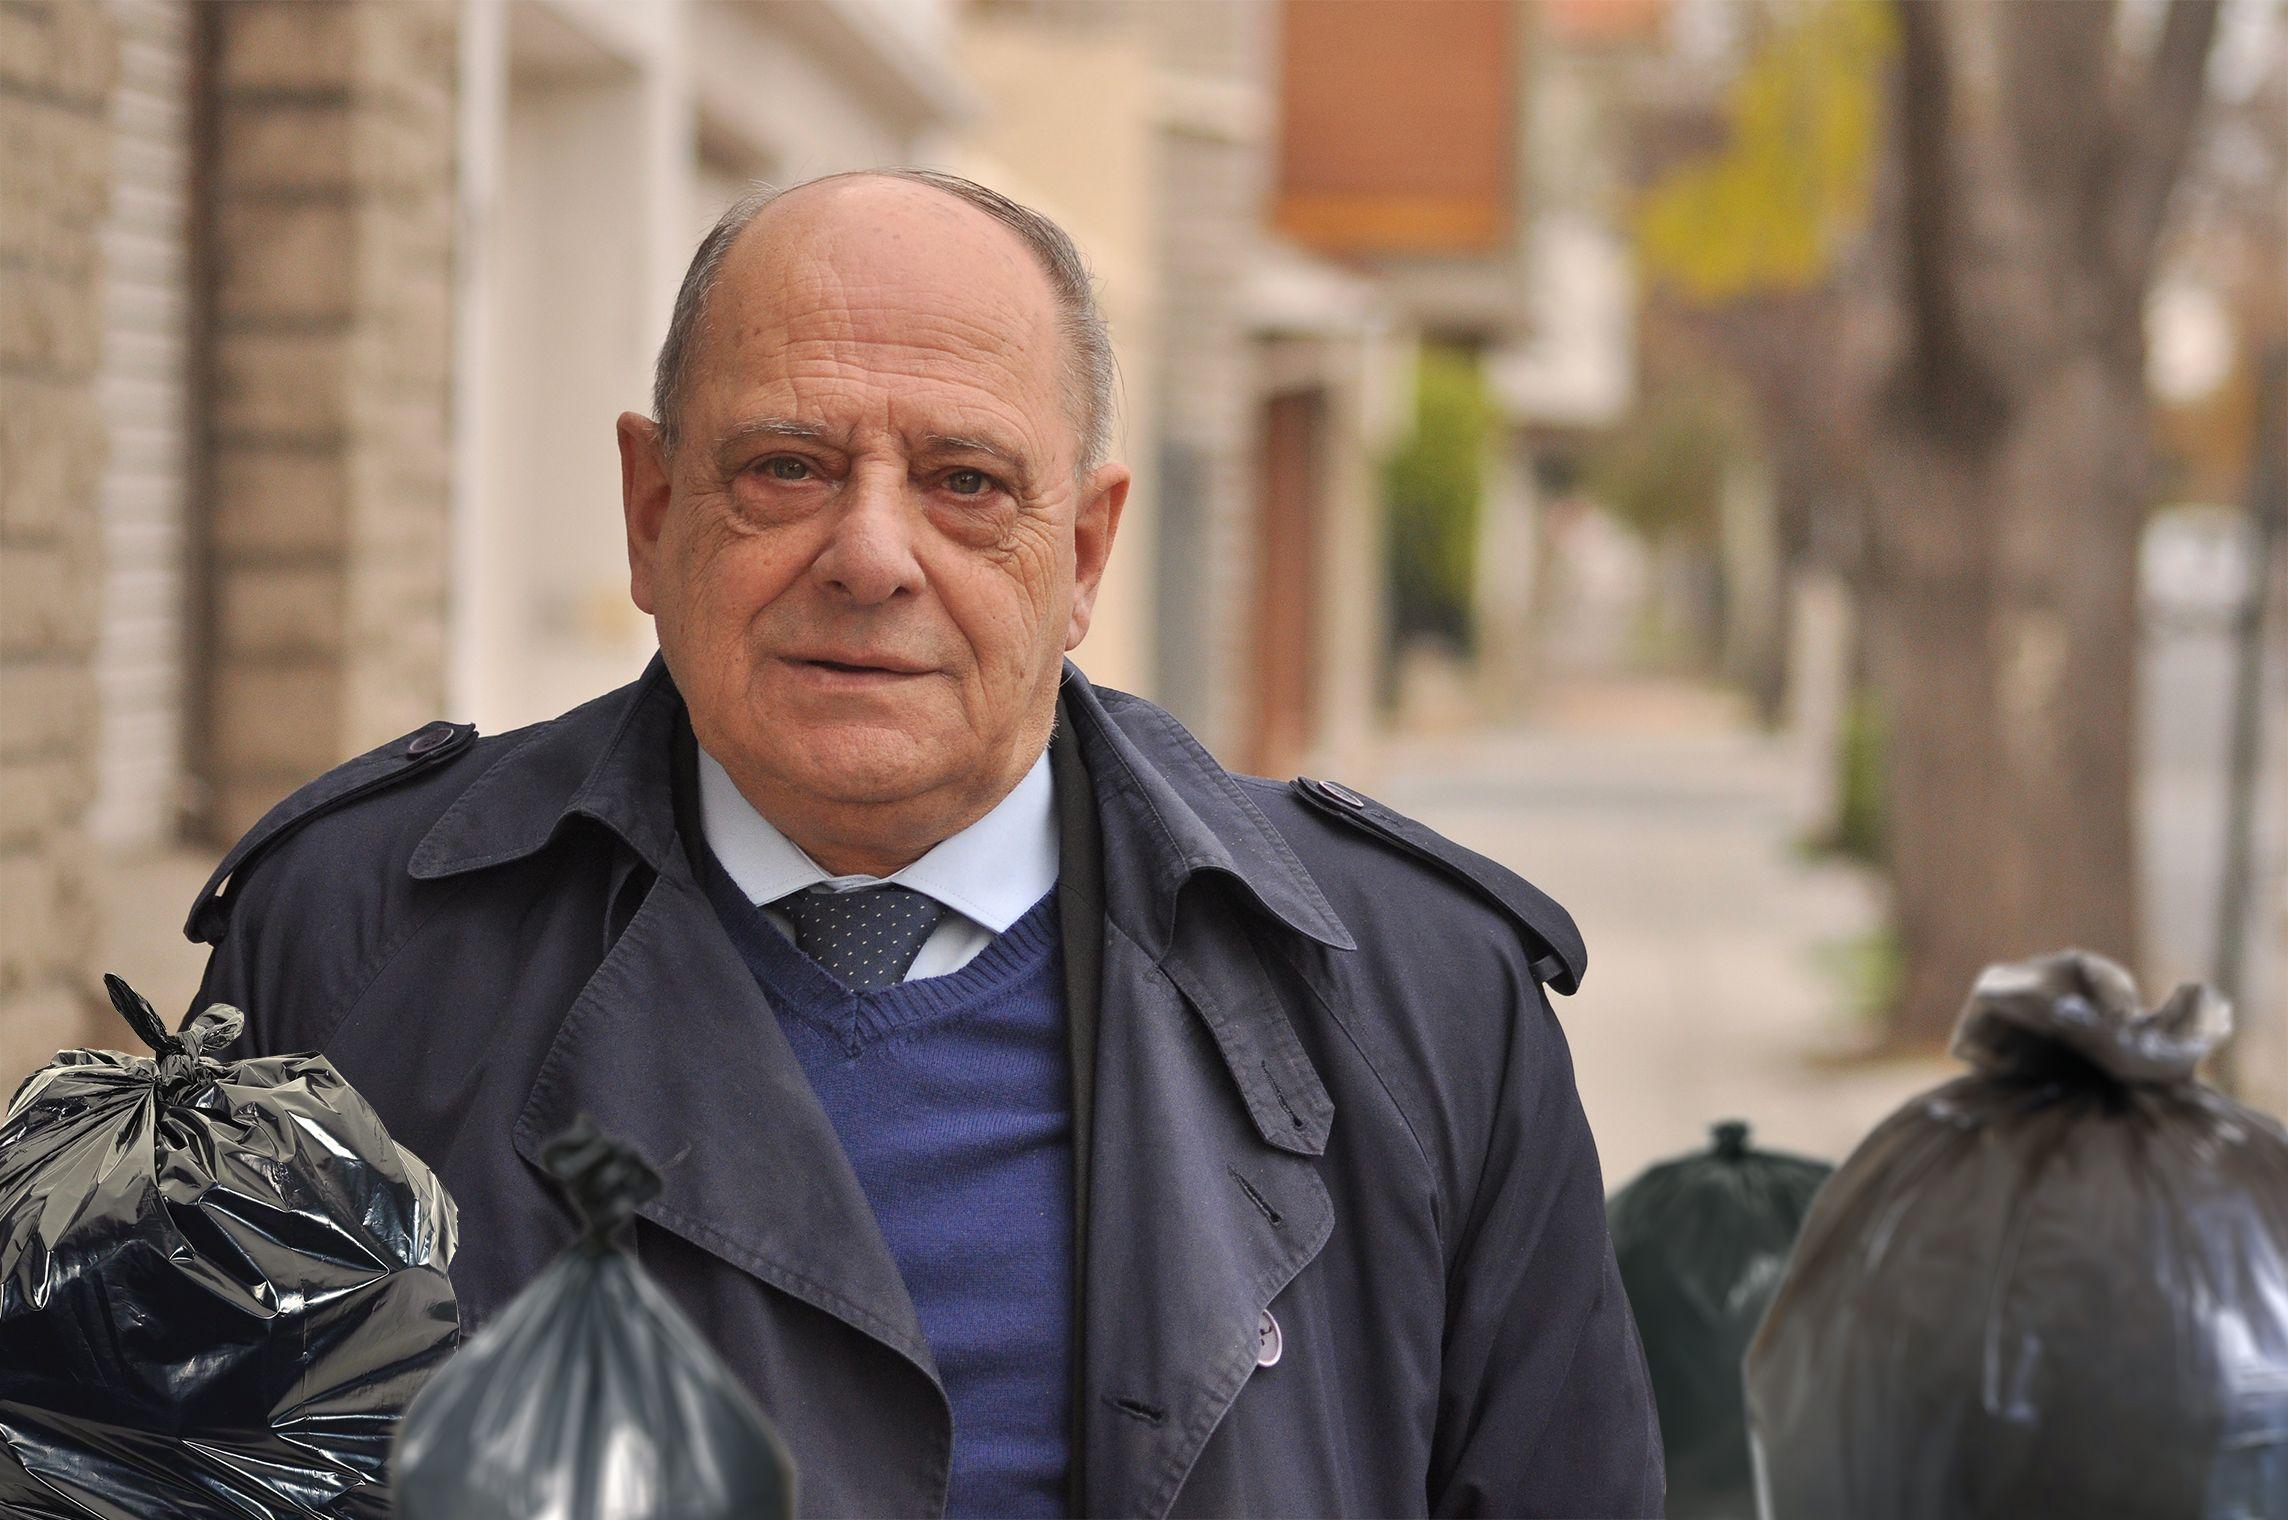 El intendente de Mar del Plata